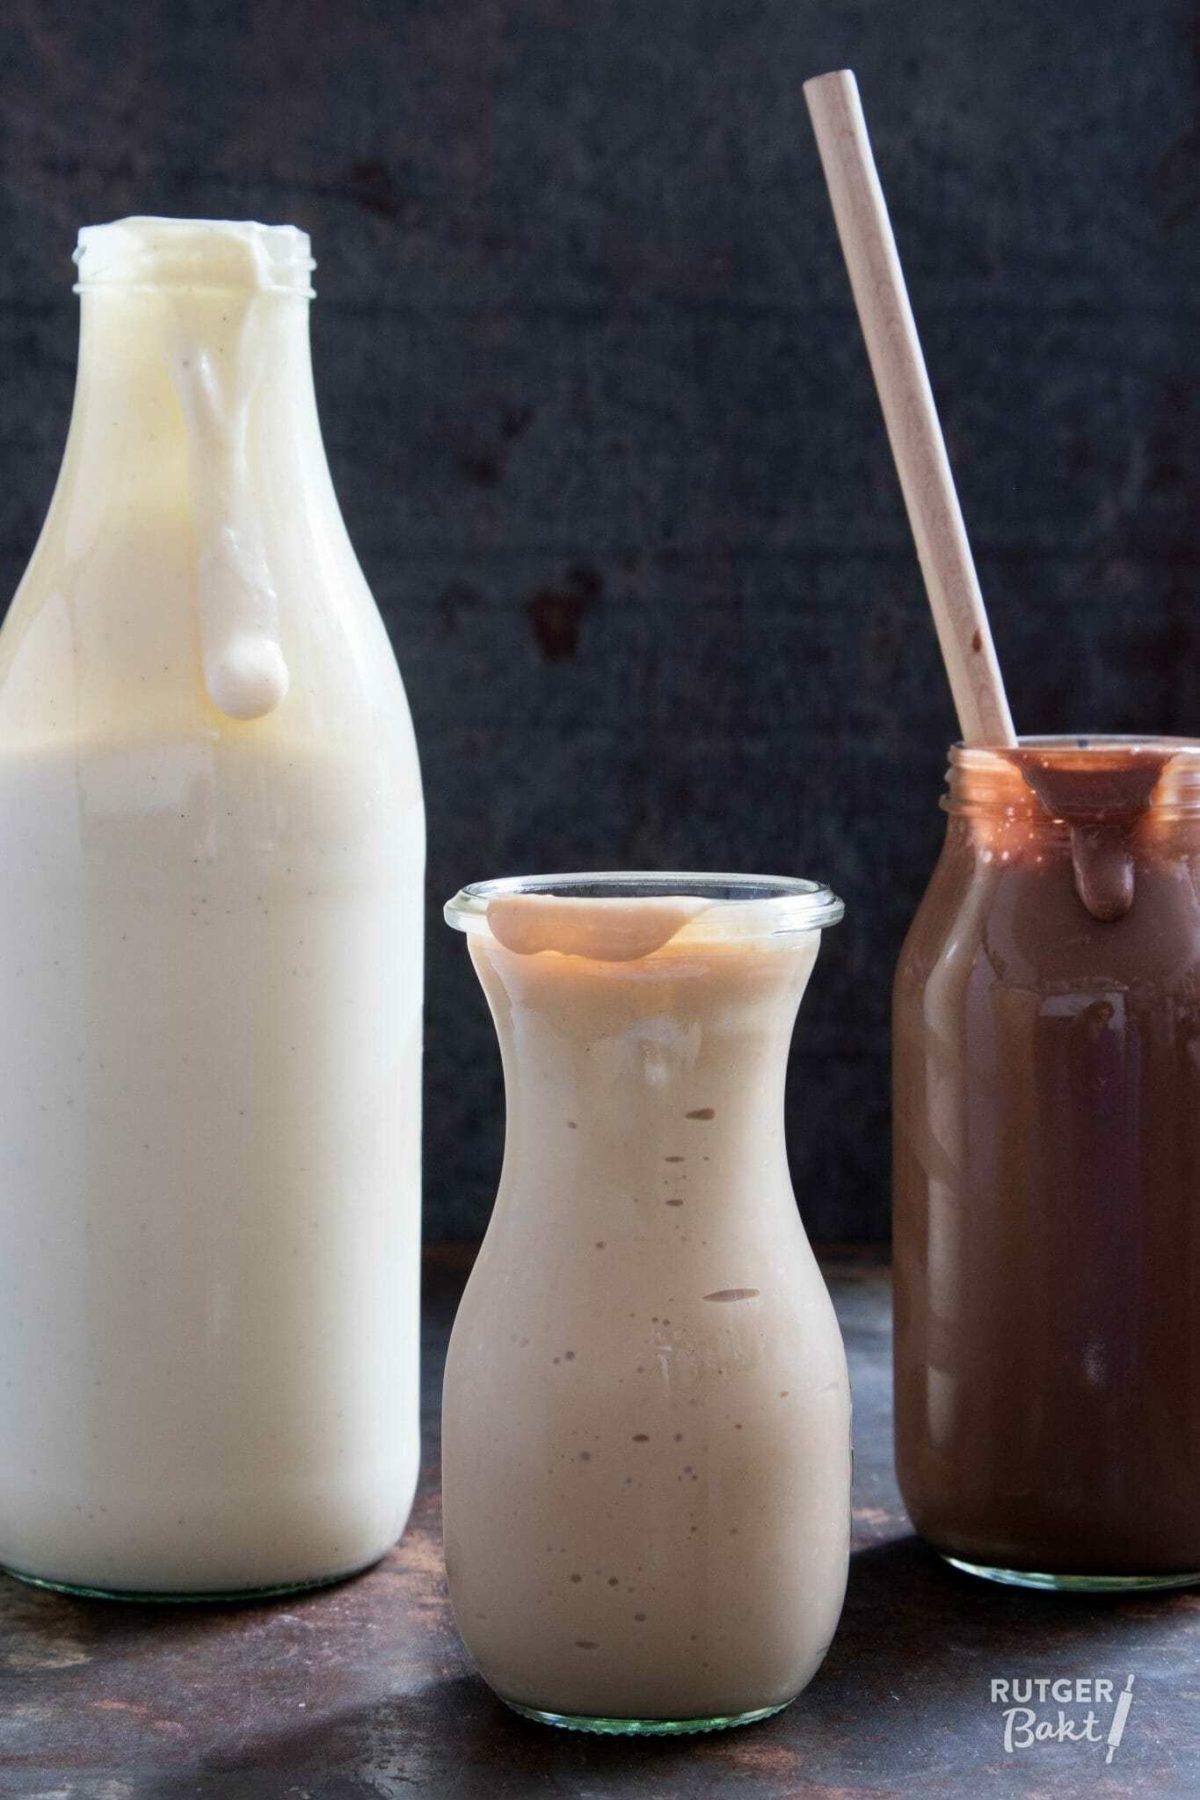 Zelf vla maken: vanillevla, karamelvla & chocoladevla